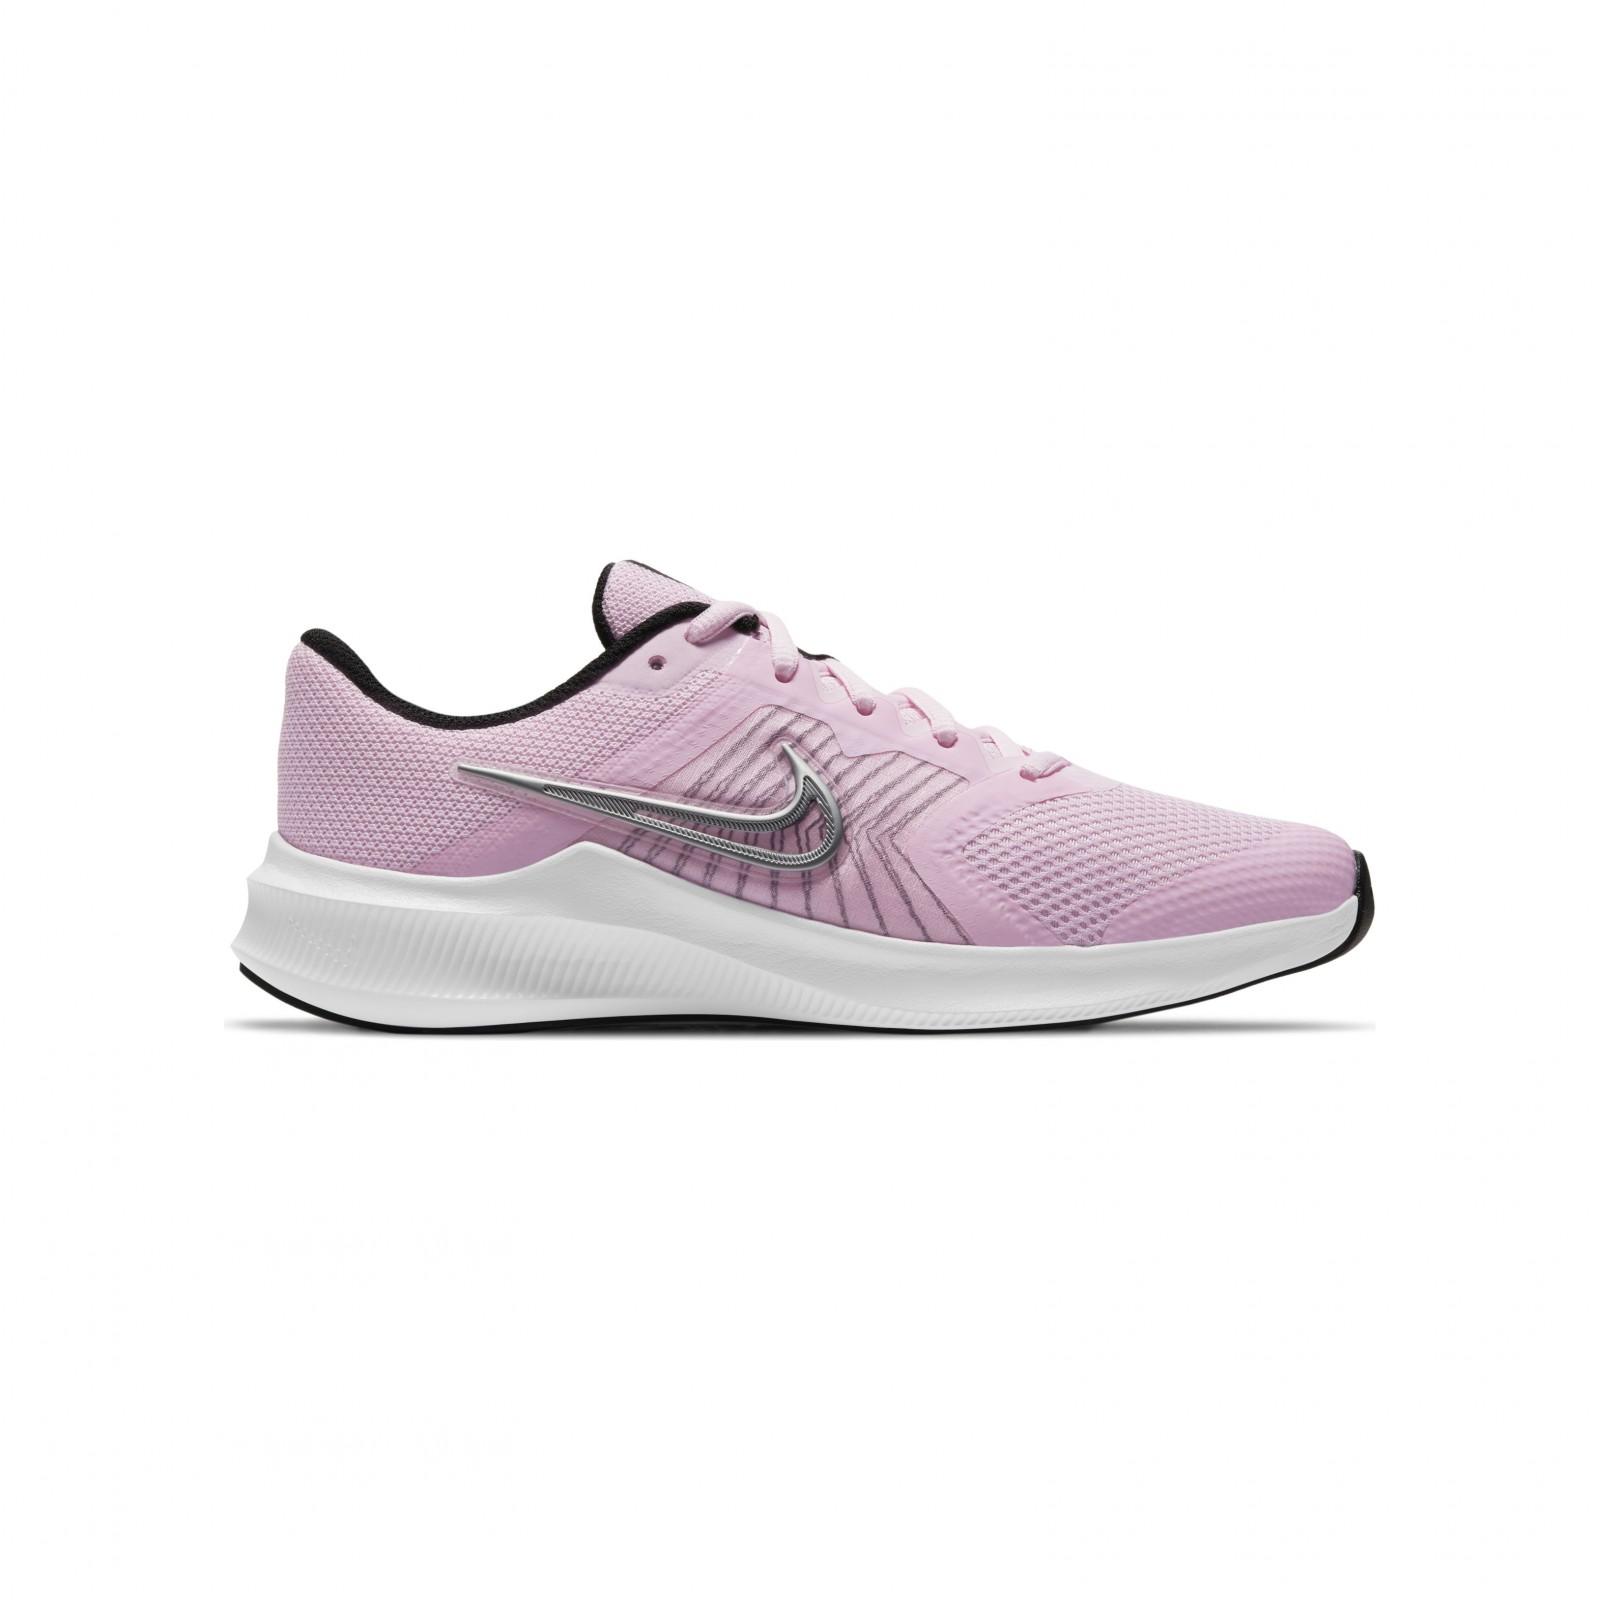 Nike Downshifter 11 PINK FOAM /METALLIC SILVER-BLACK-WHITE